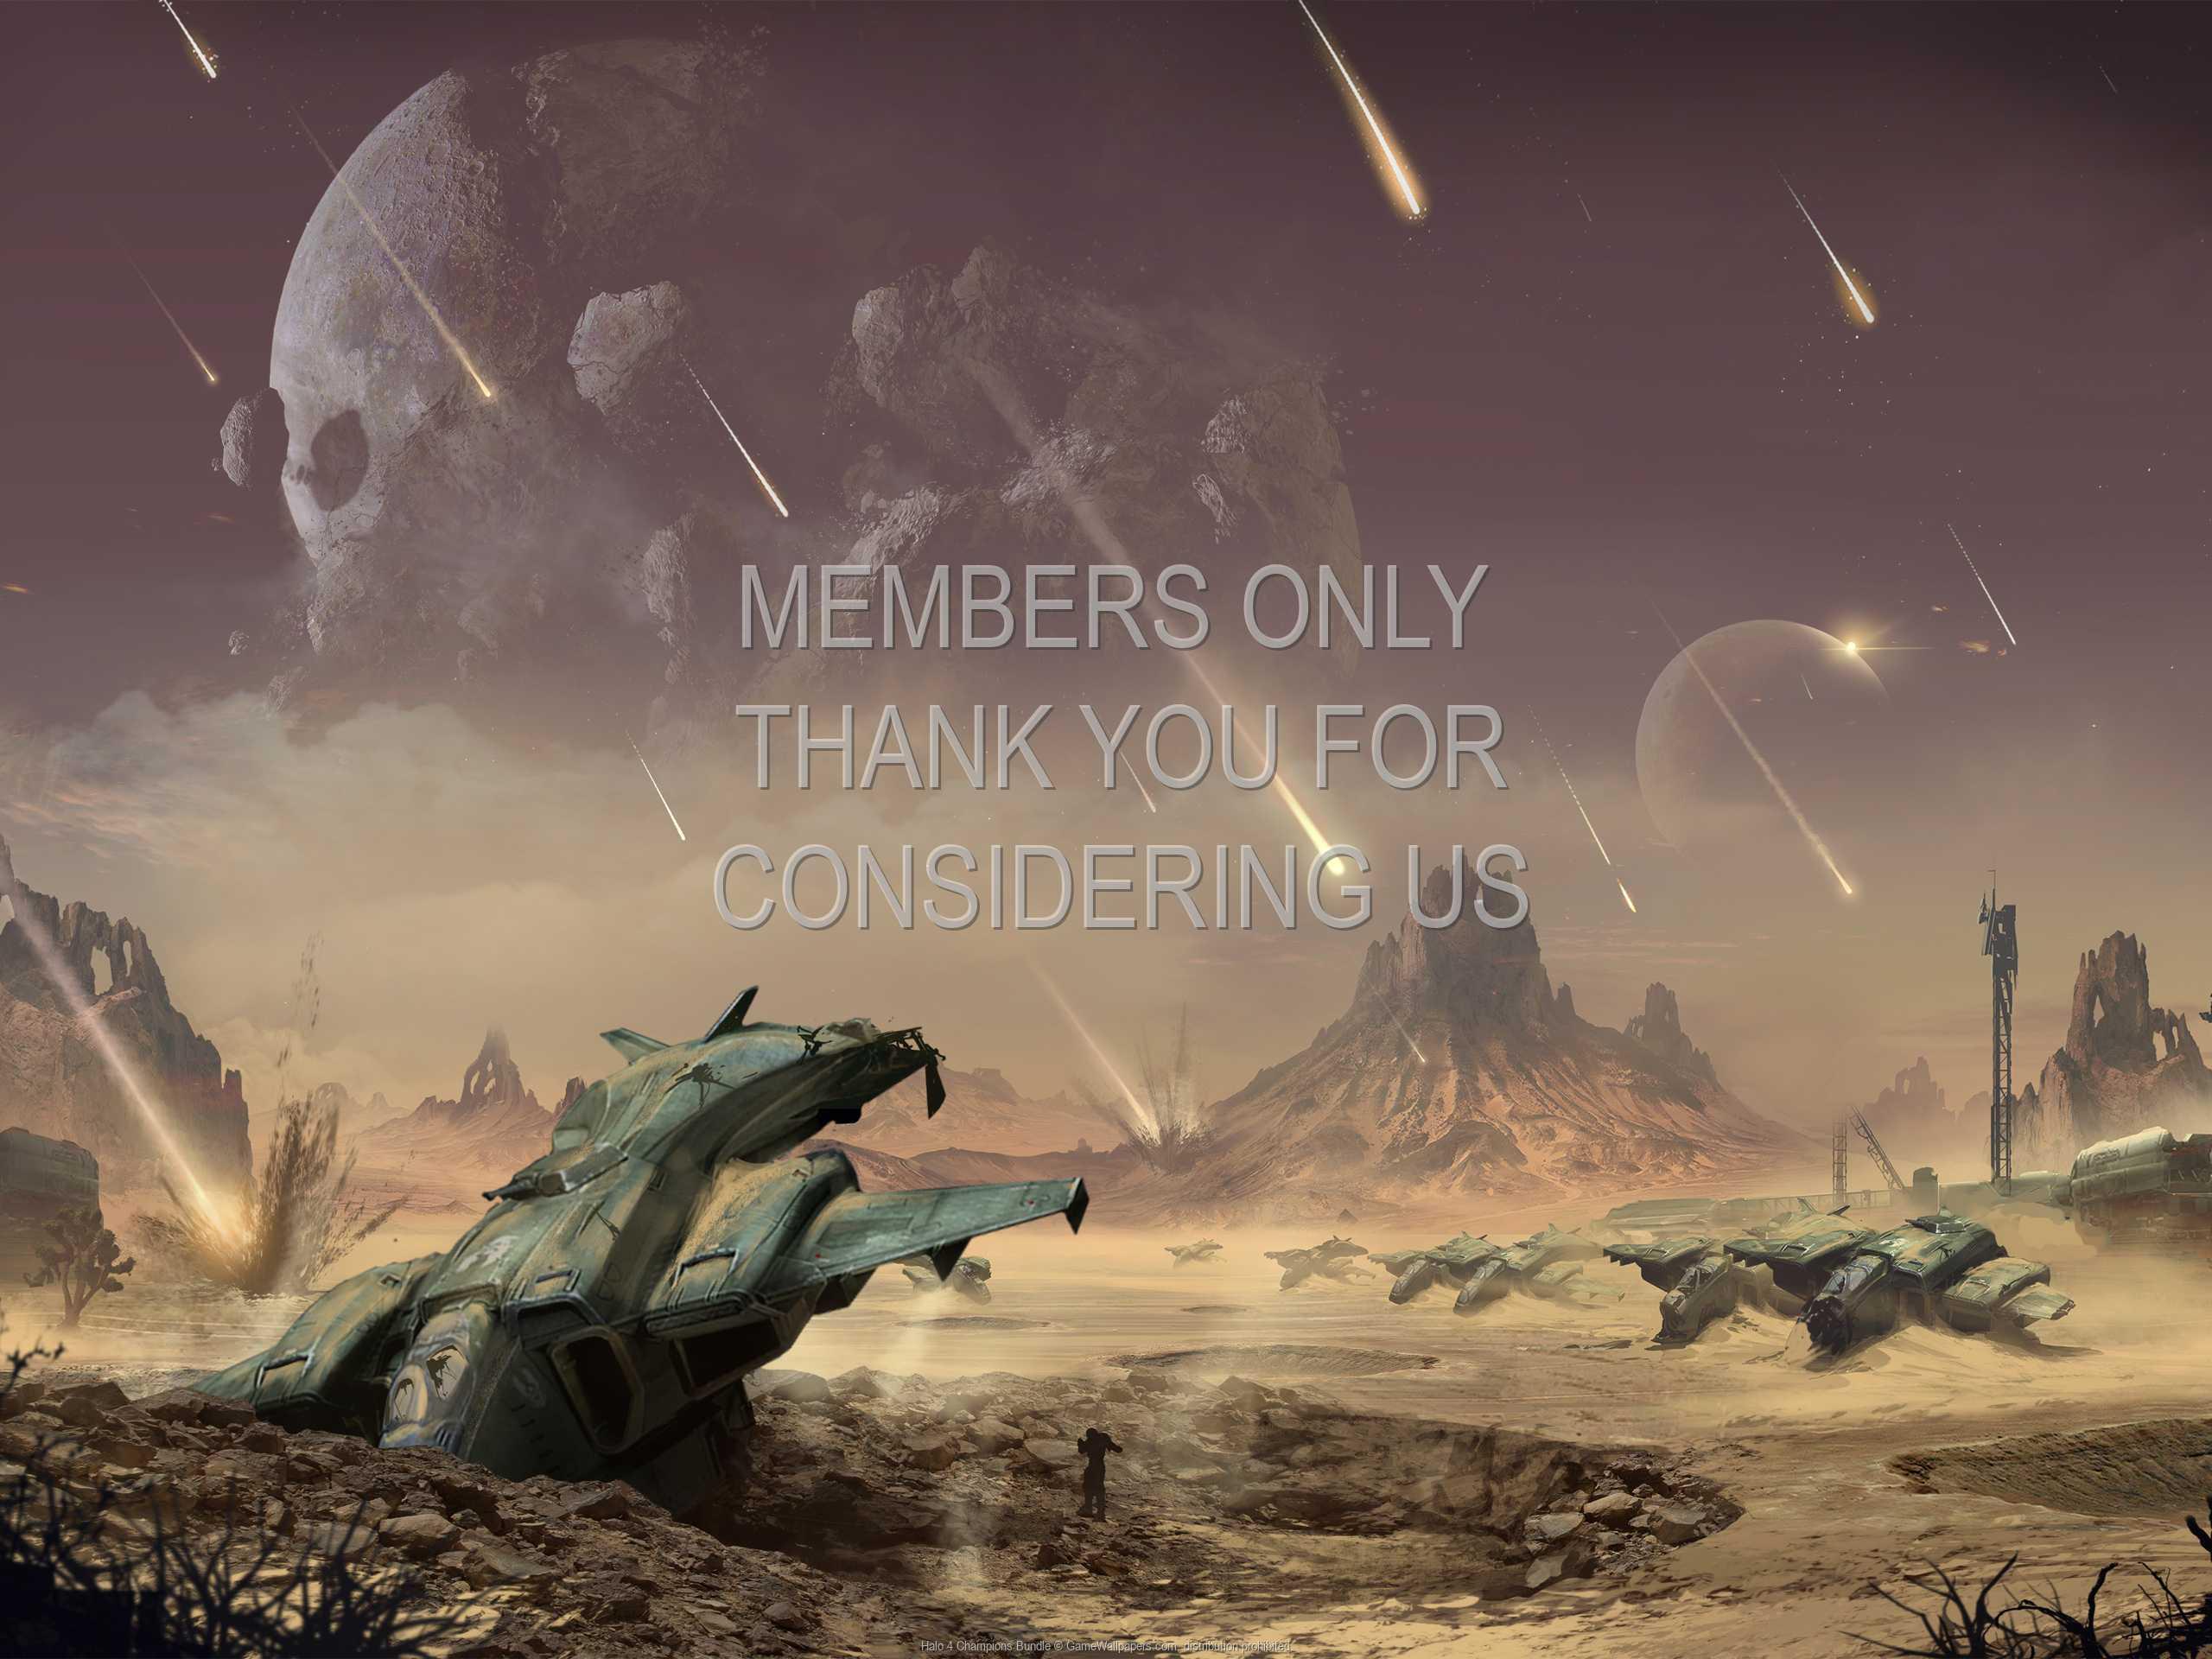 Halo 4 Champions Bundle 1080p Horizontal Mobile wallpaper or background 01